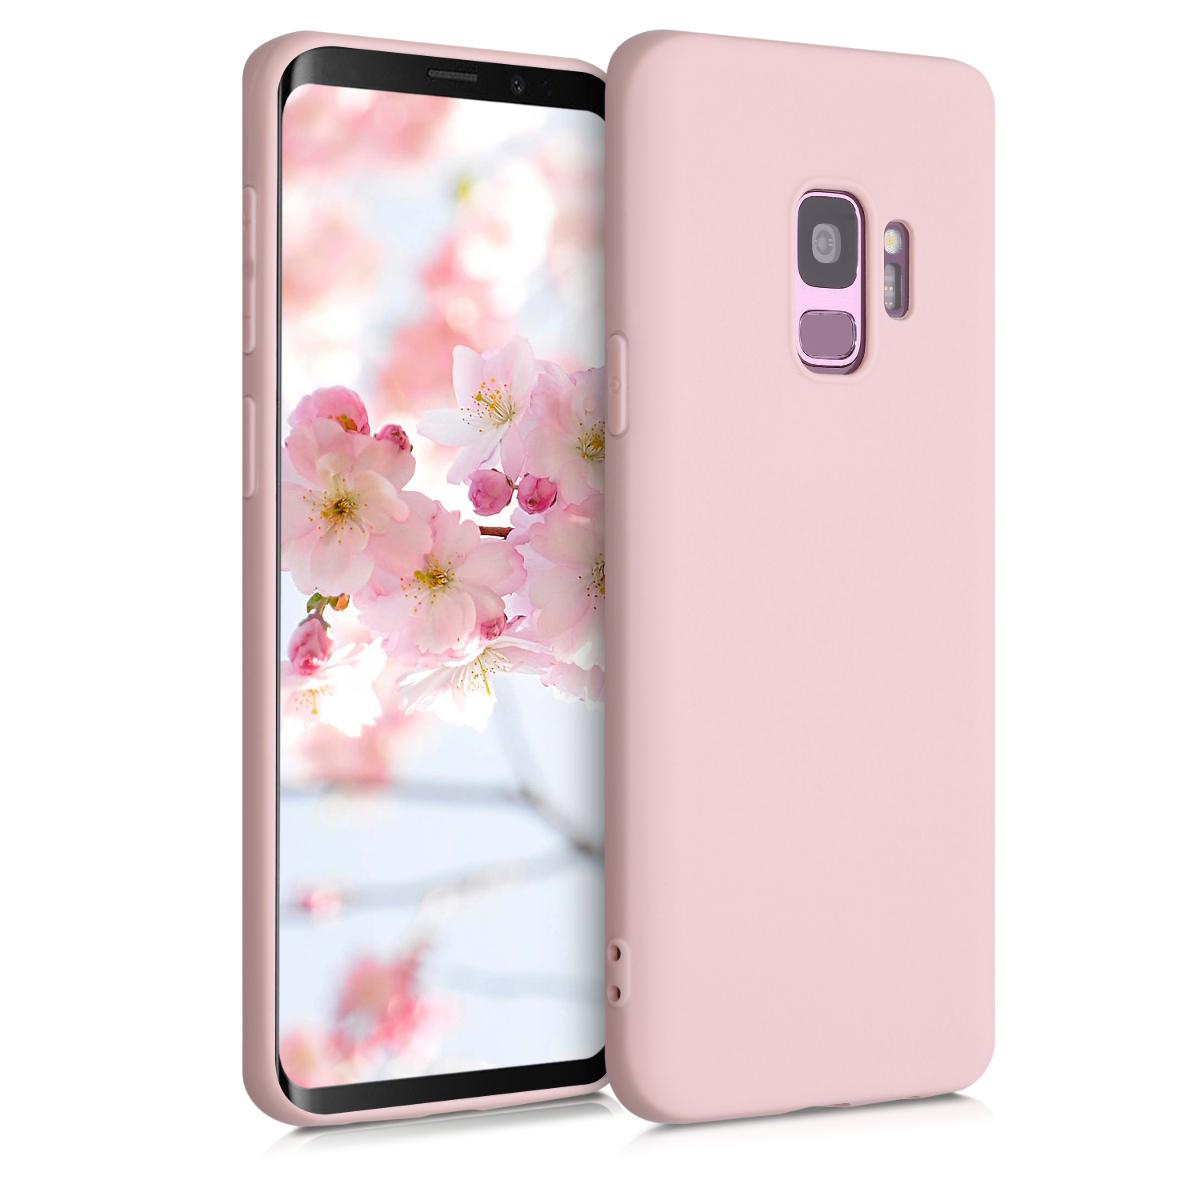 TPU Silikonové pouzdro pro Samsung Galaxy S9 - Soft Flexible Protective Phone Cover - Peach Skin